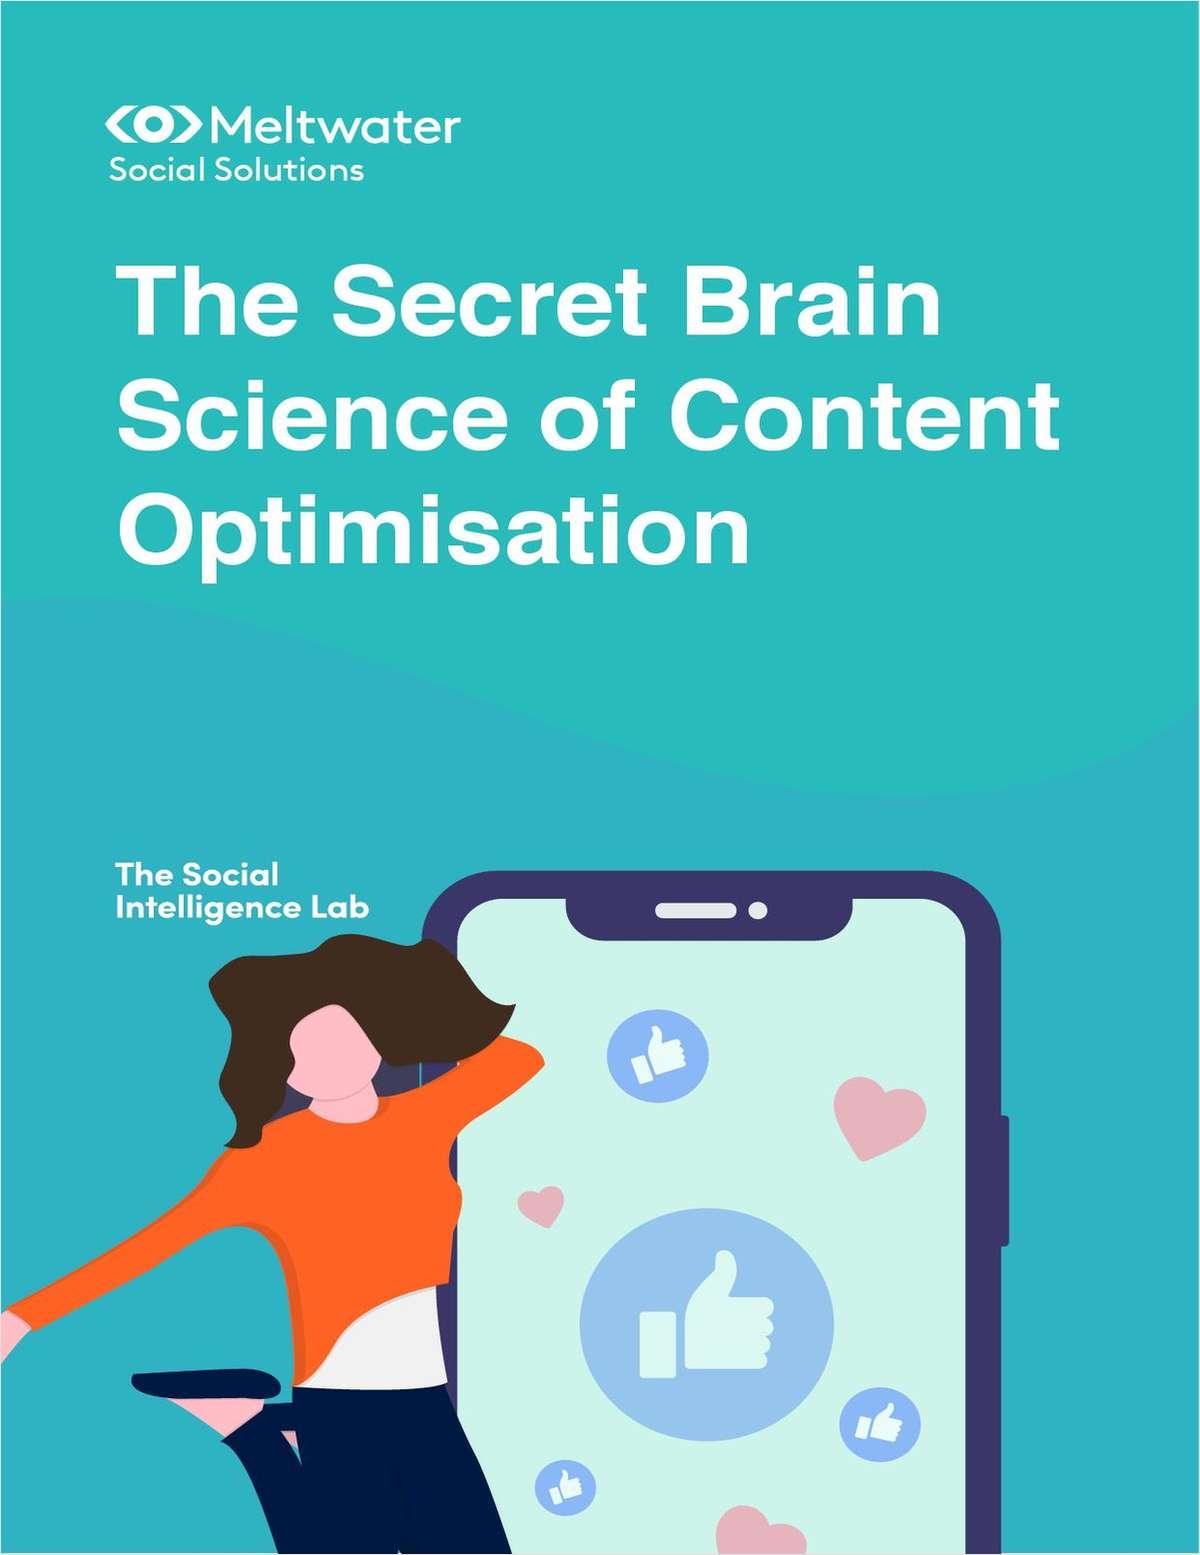 The Secret Brain Science of Content Optimization